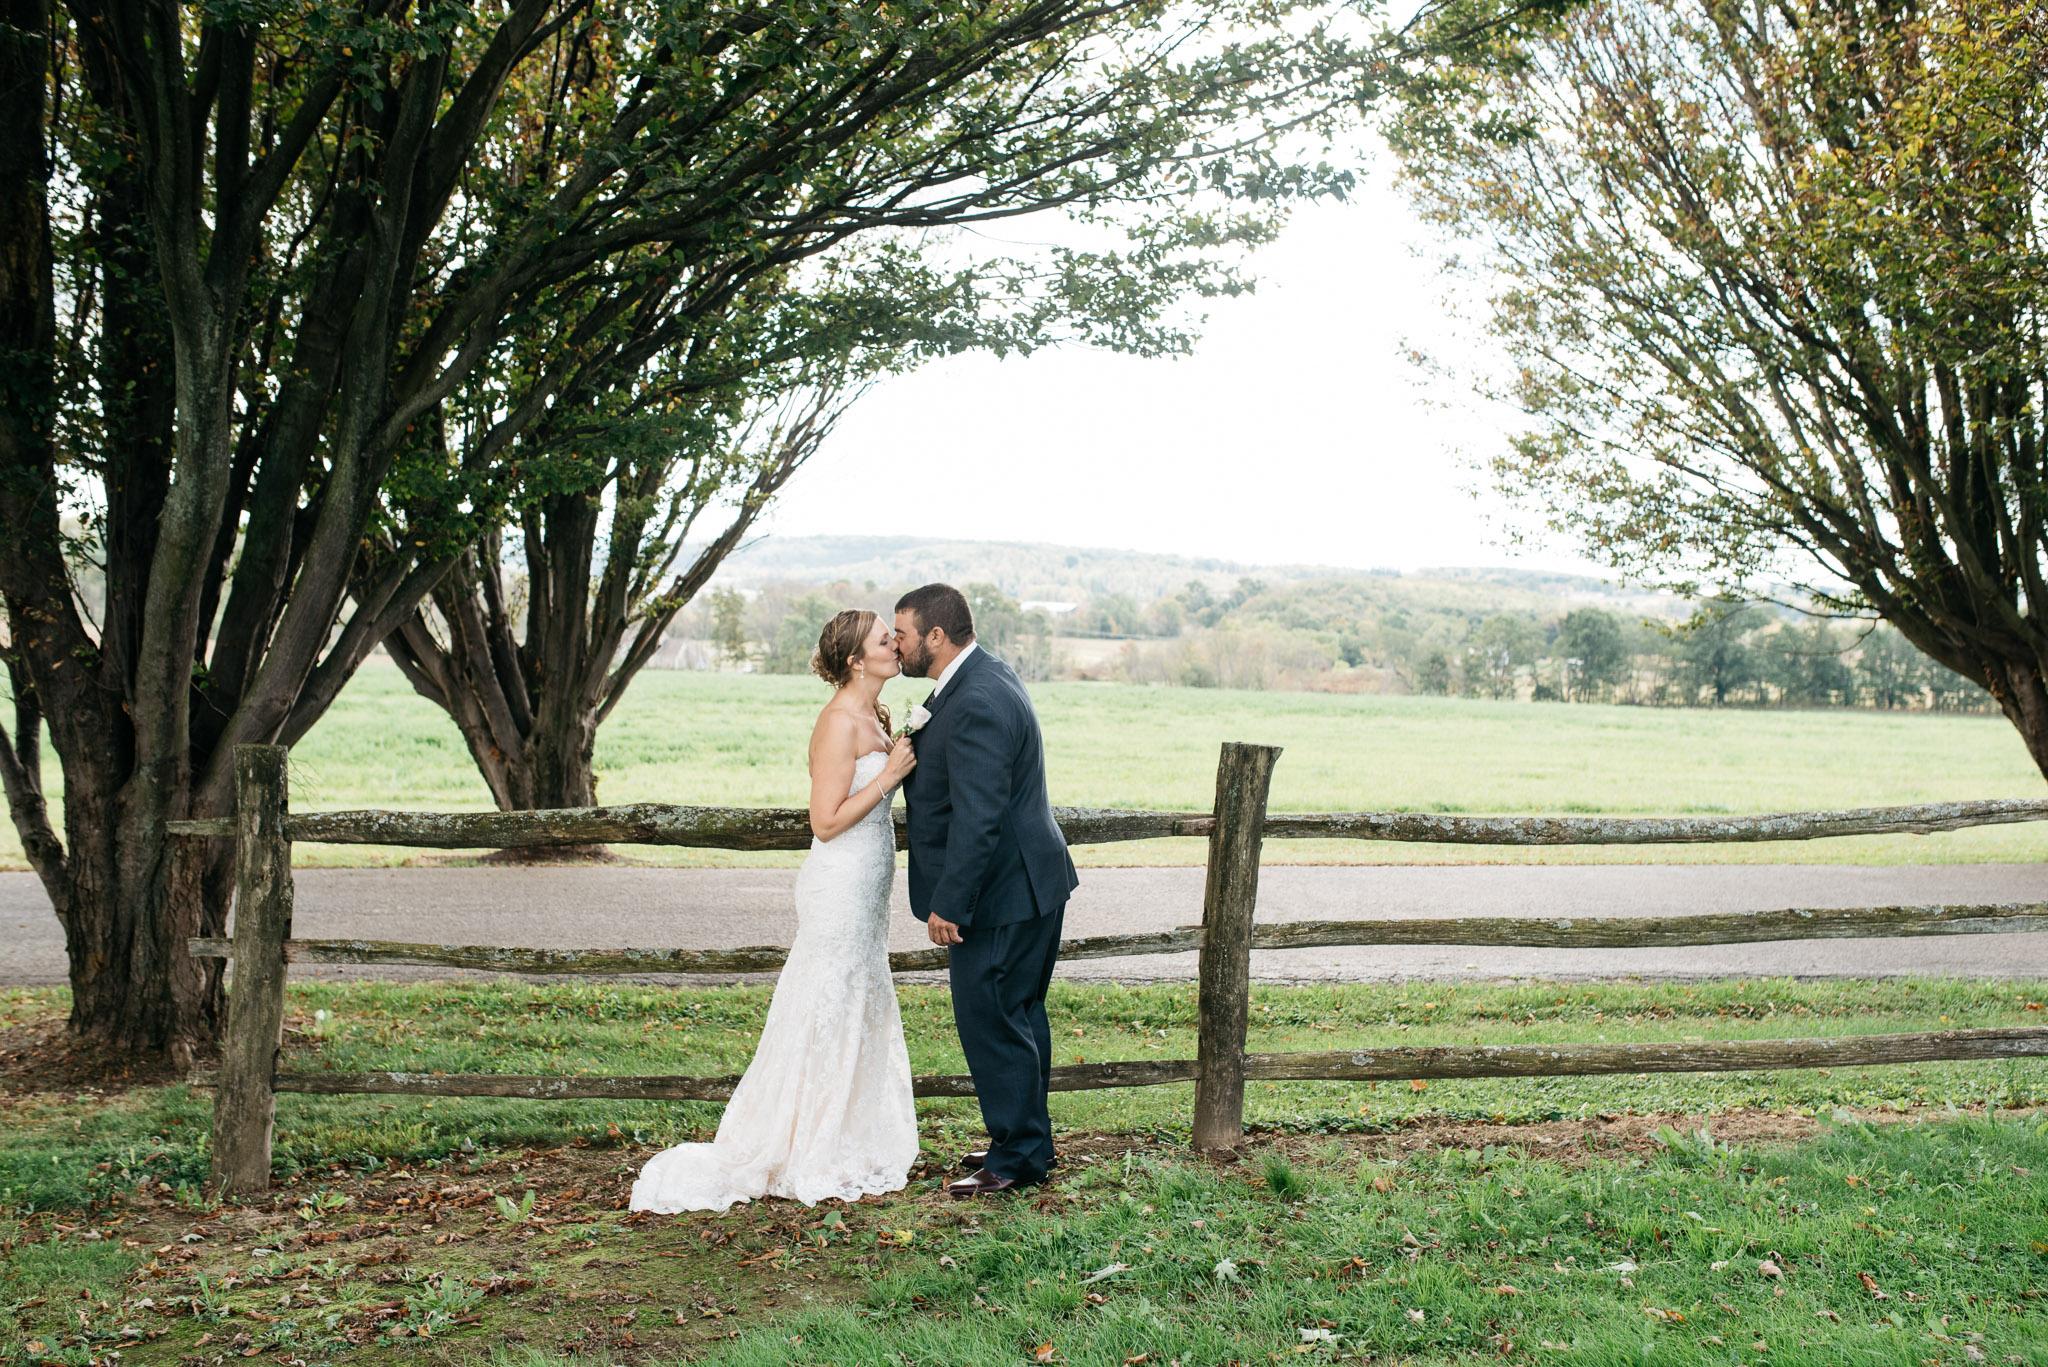 pittsburgh-ligonier-wedding-photographer-the-event-barn-at-highland-farms-1004.jpg